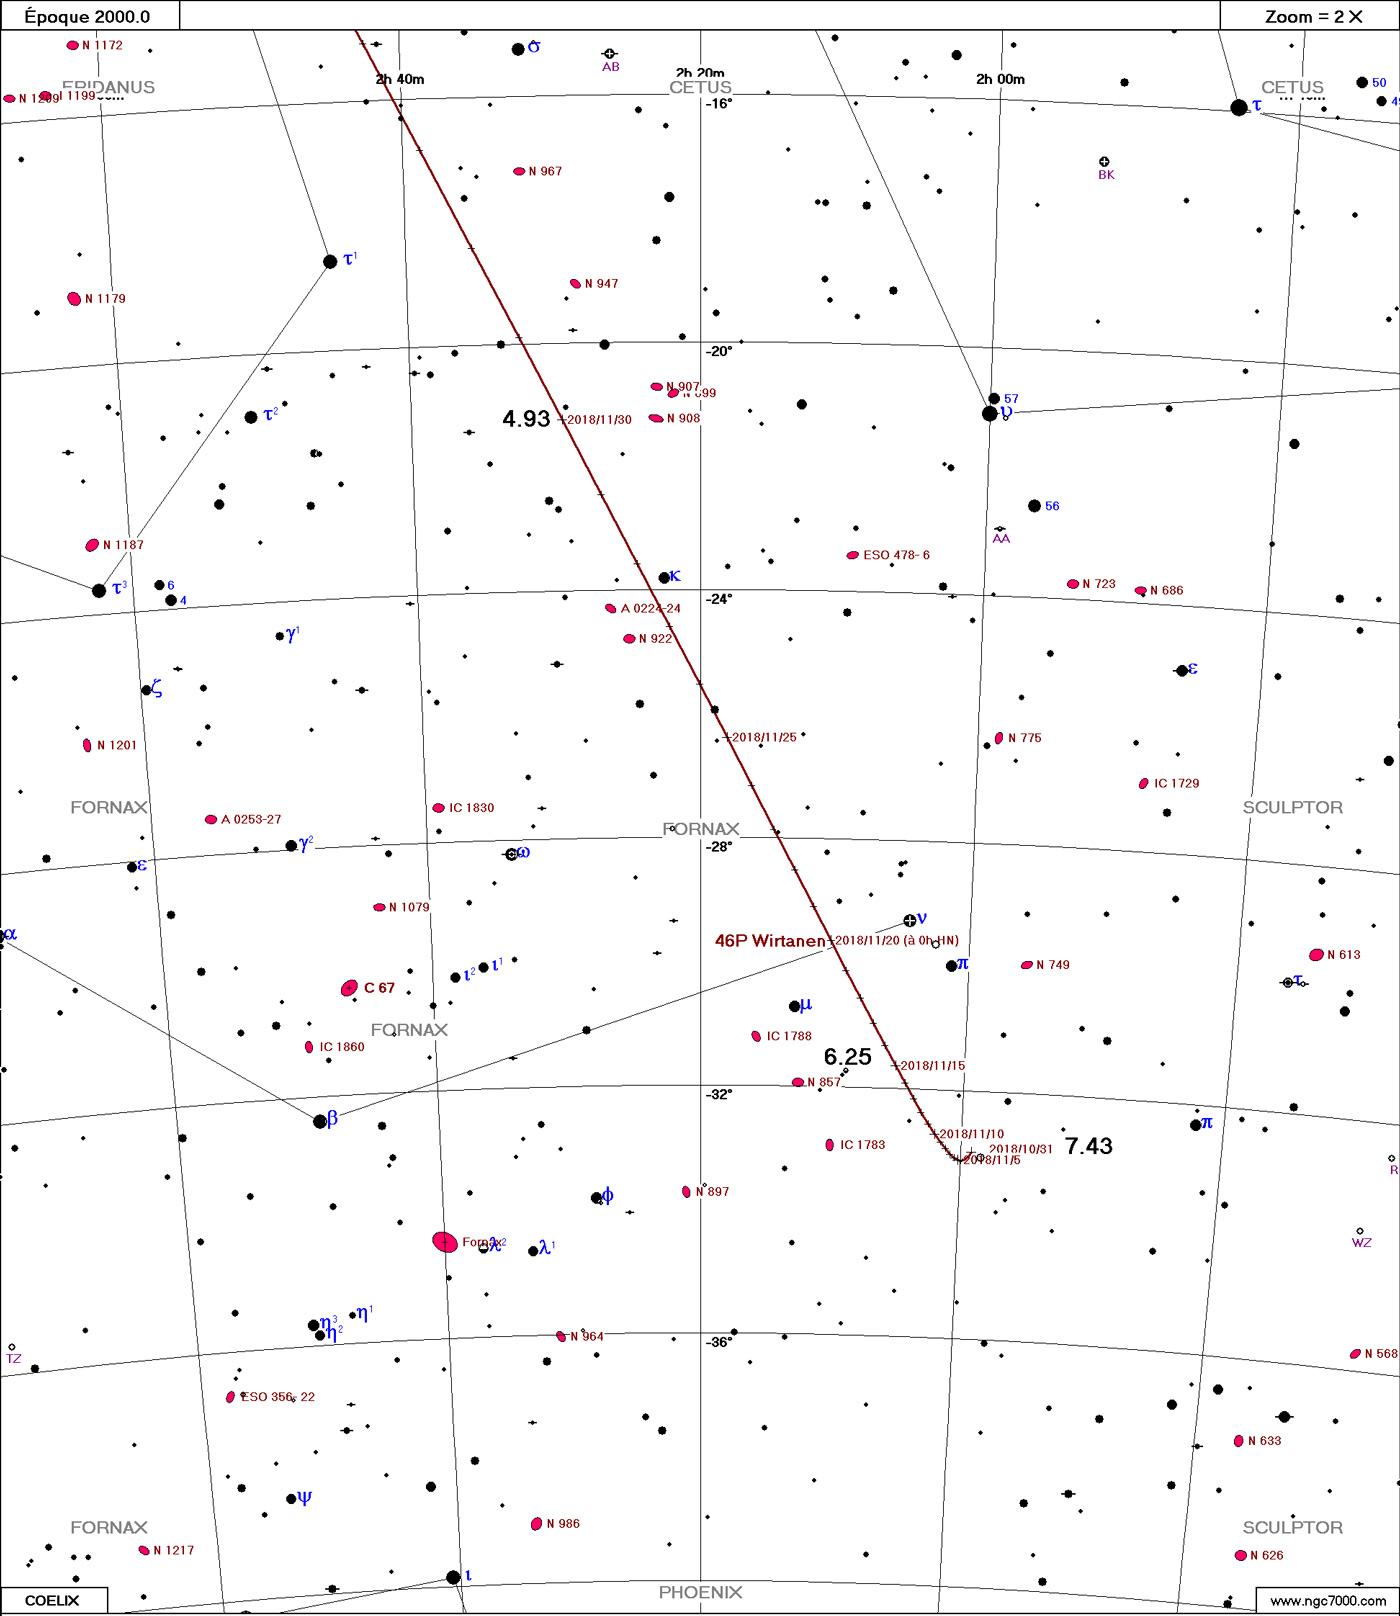 Comète 46P/Wirtanen Wirtanen11